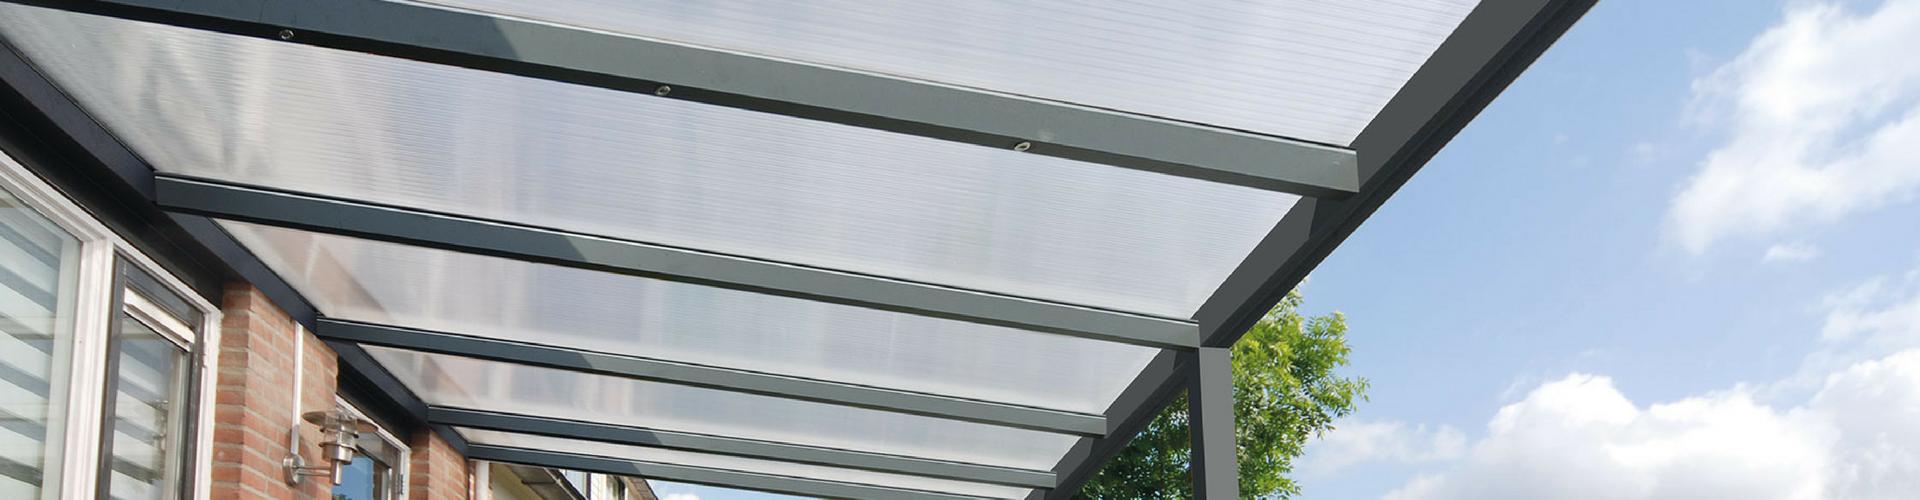 aluminium veranda met polycarbonaat dakbedekking